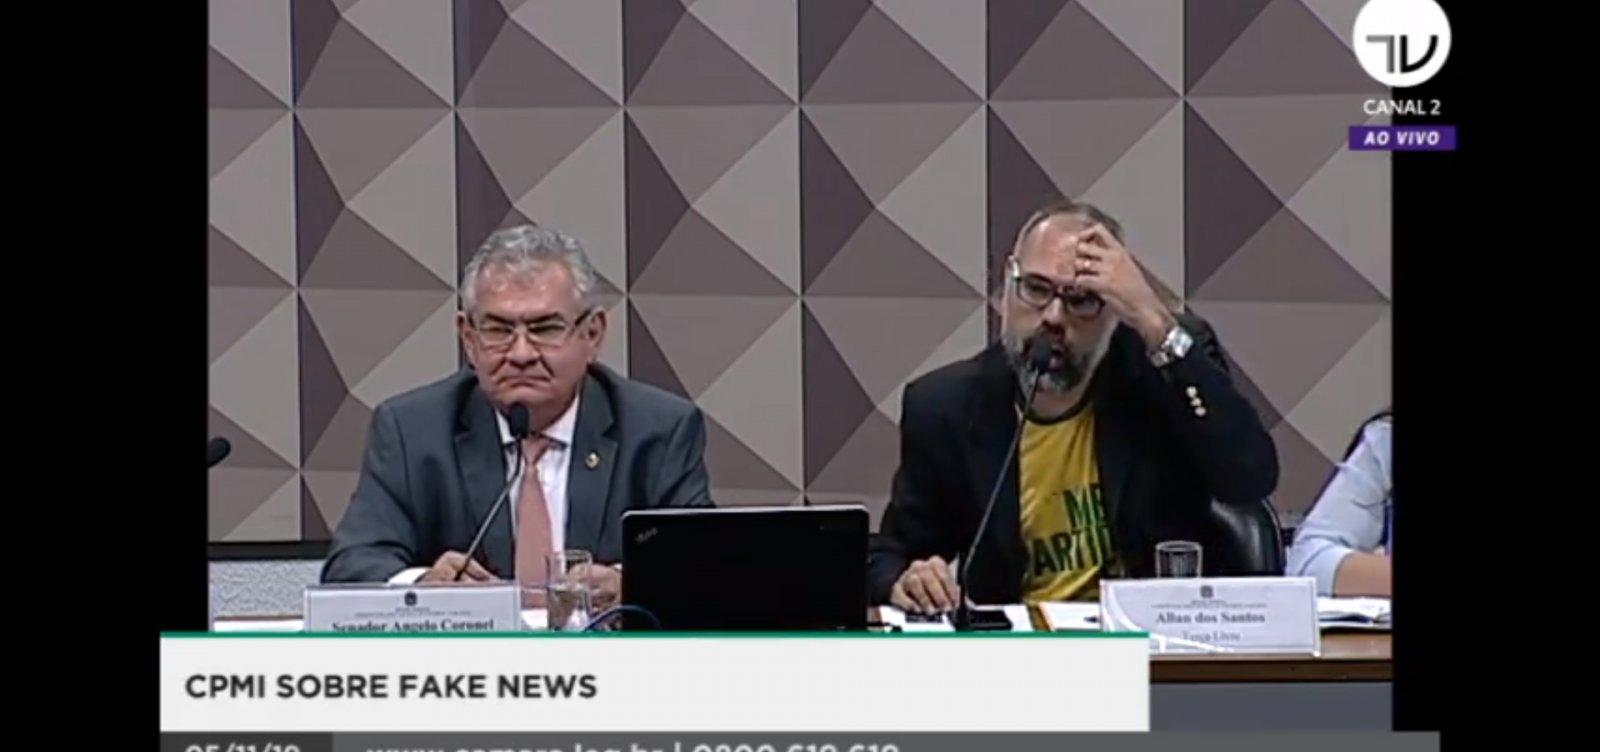 Terra plana e 'ingrês' movimentam CPMI das fake news; veja